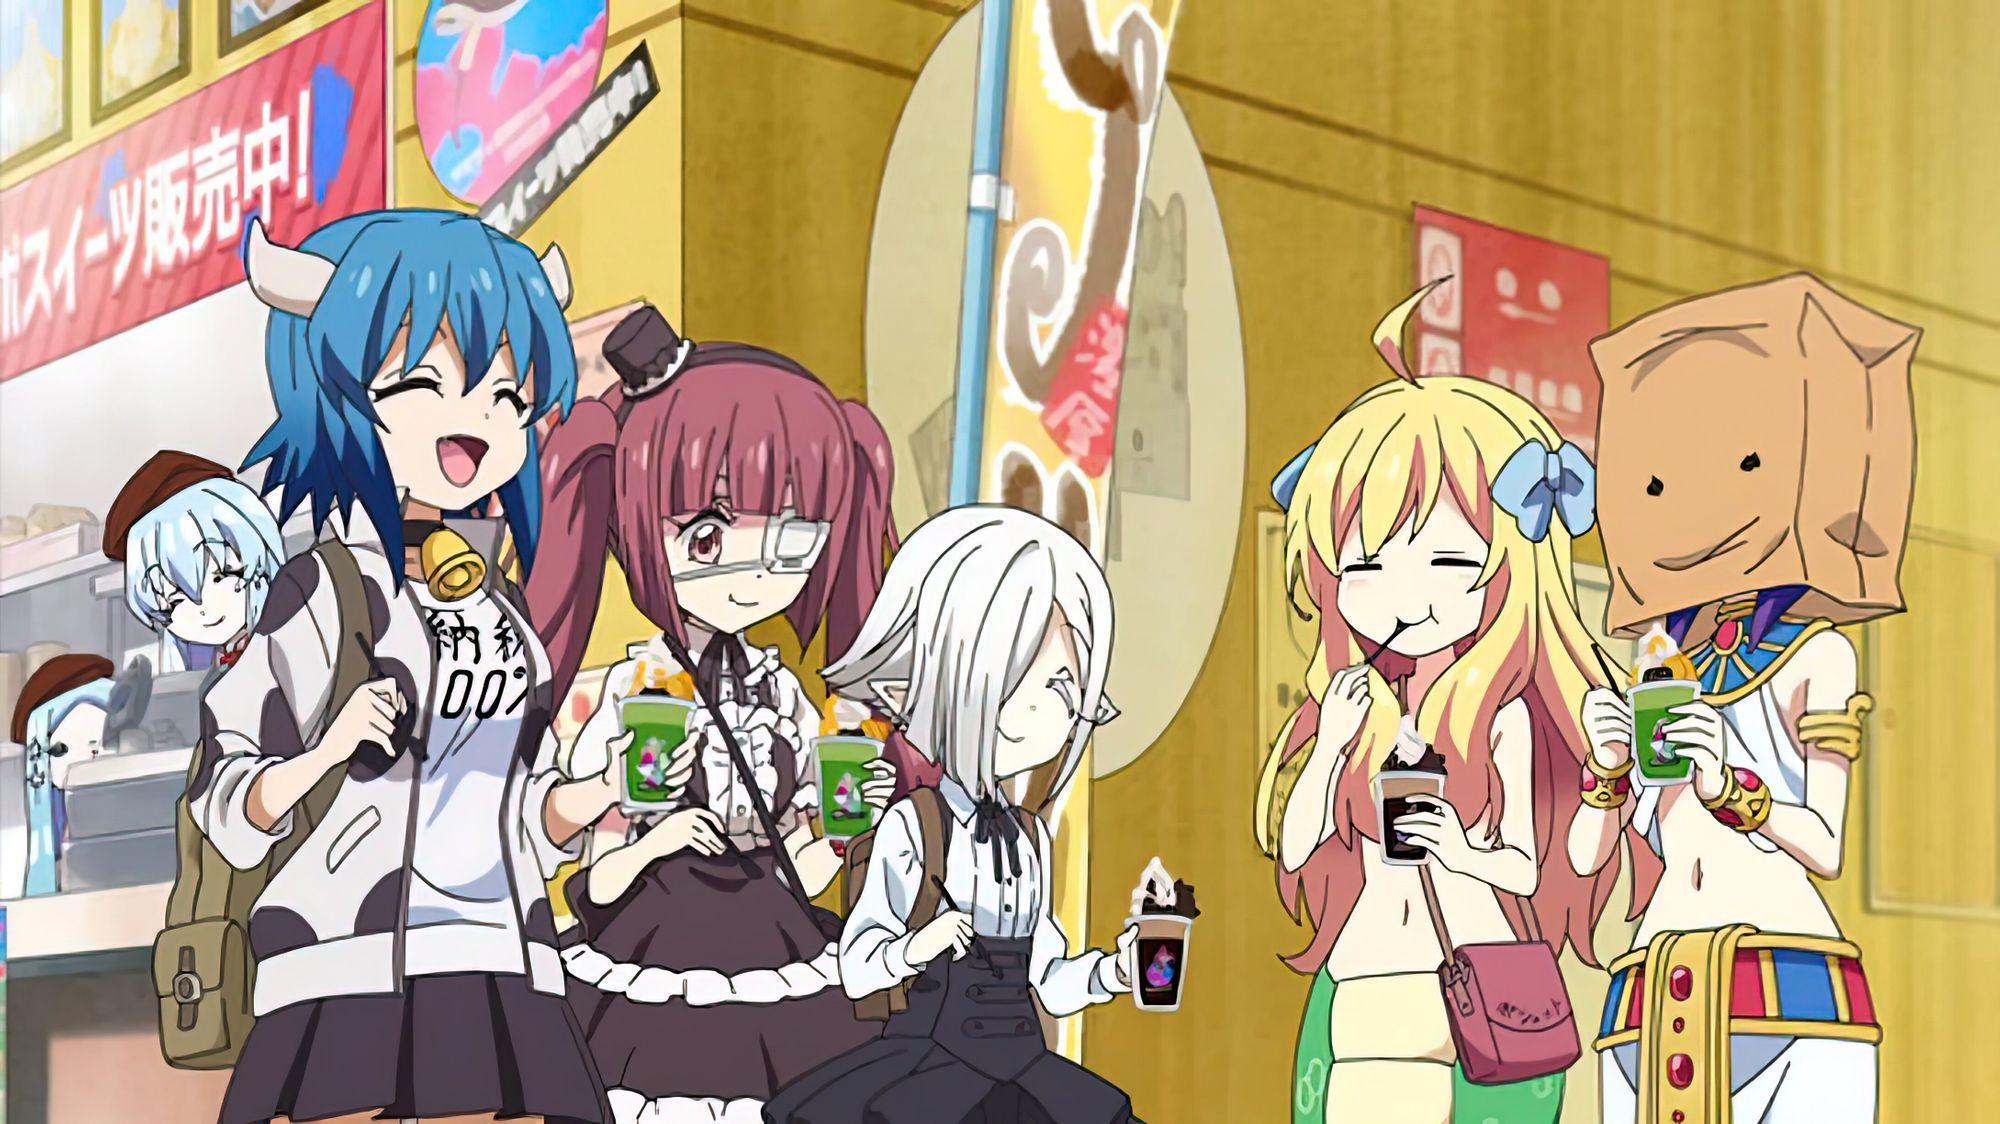 anime like jahy-sama anime, Jashin-chan Dropkick